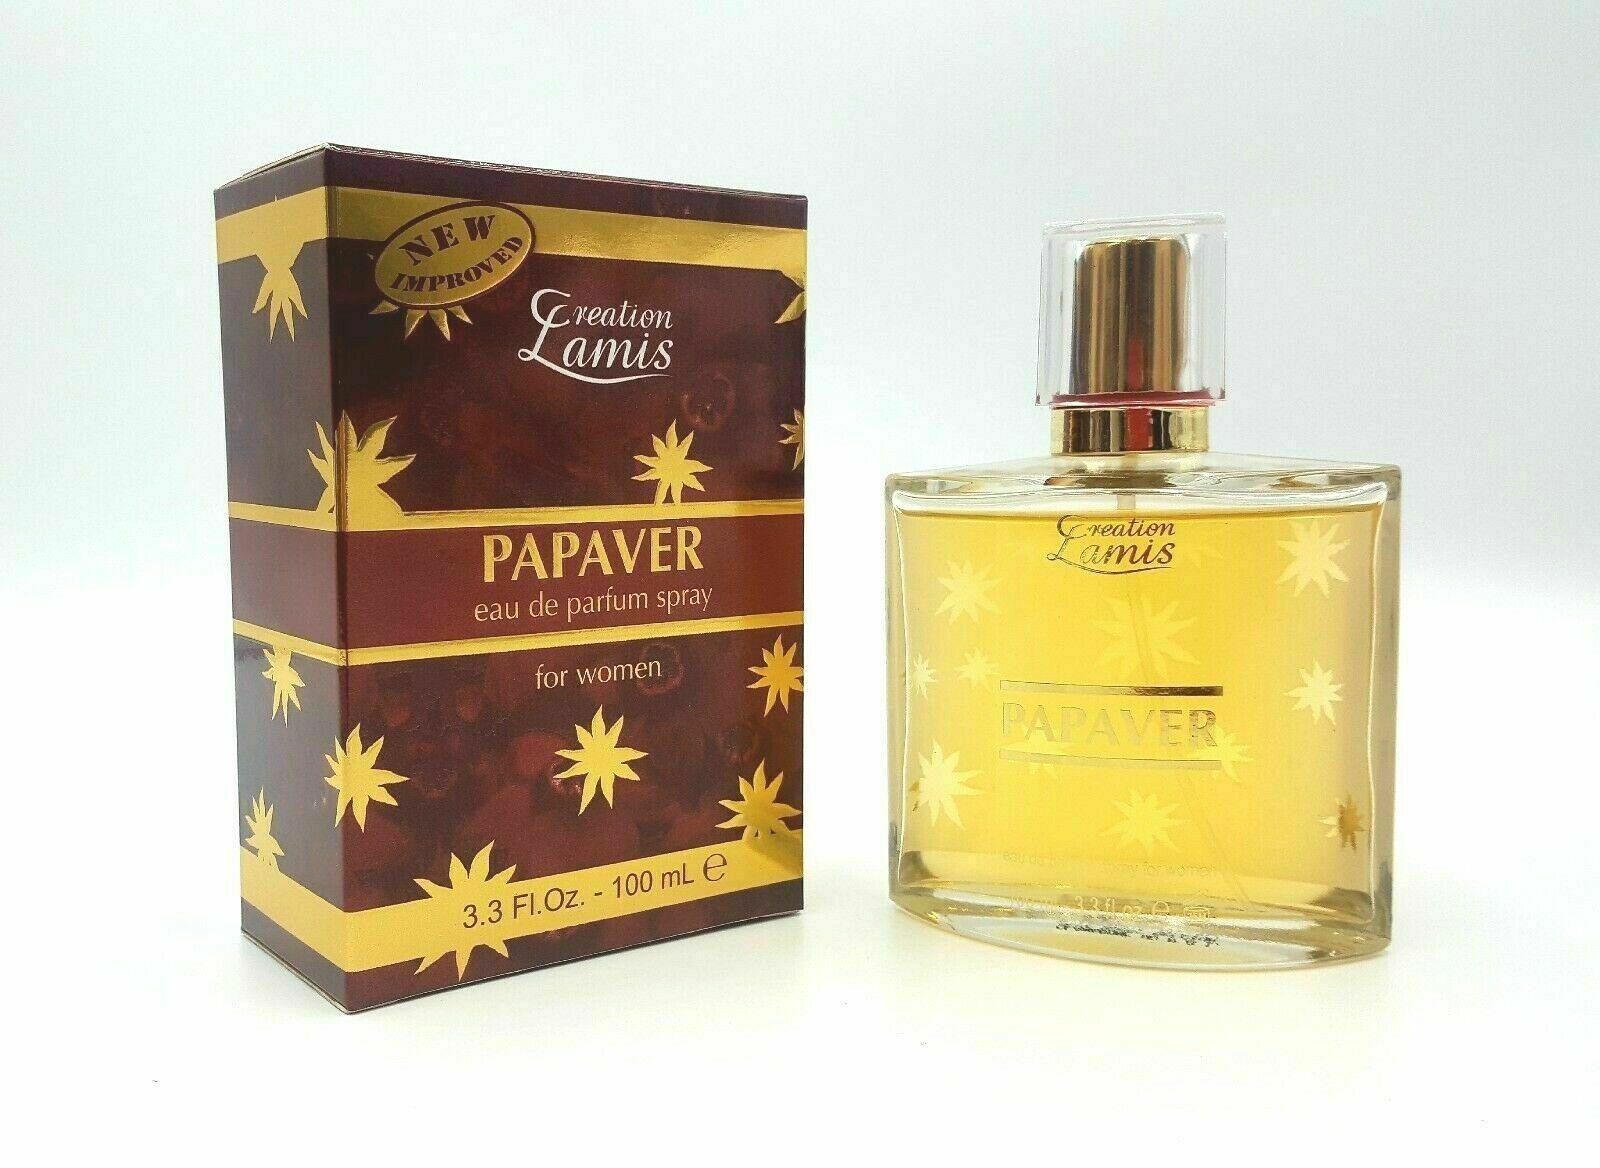 parfum generique parfum lamis femme papaver lamis